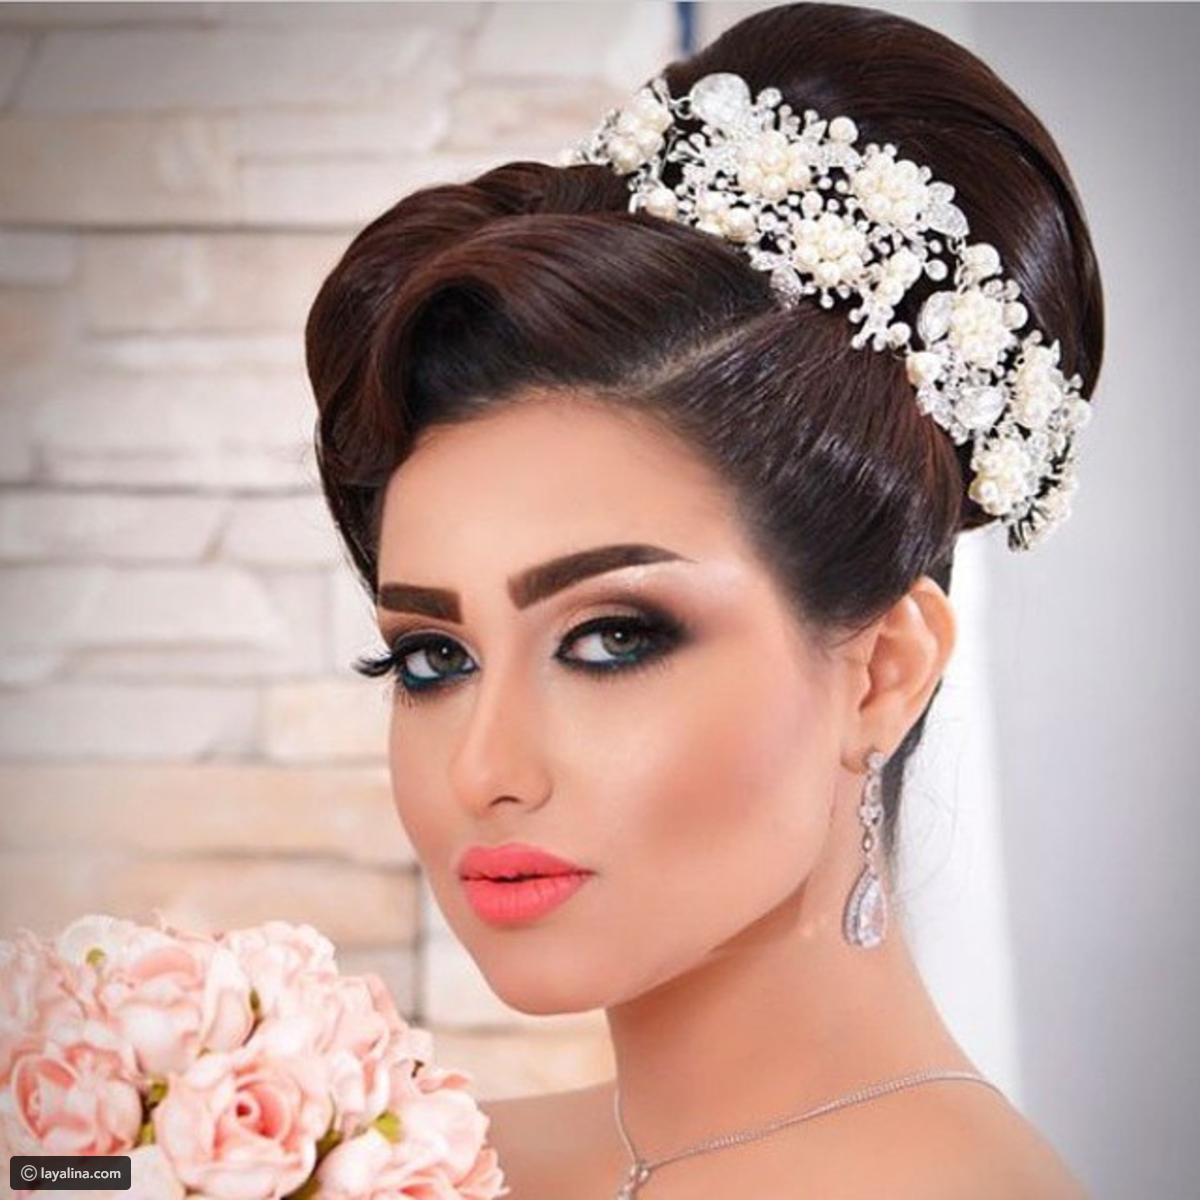 بالصور صور مكياج عرايس ناعم , عروسات جميلات بارق المكياج 1009 6